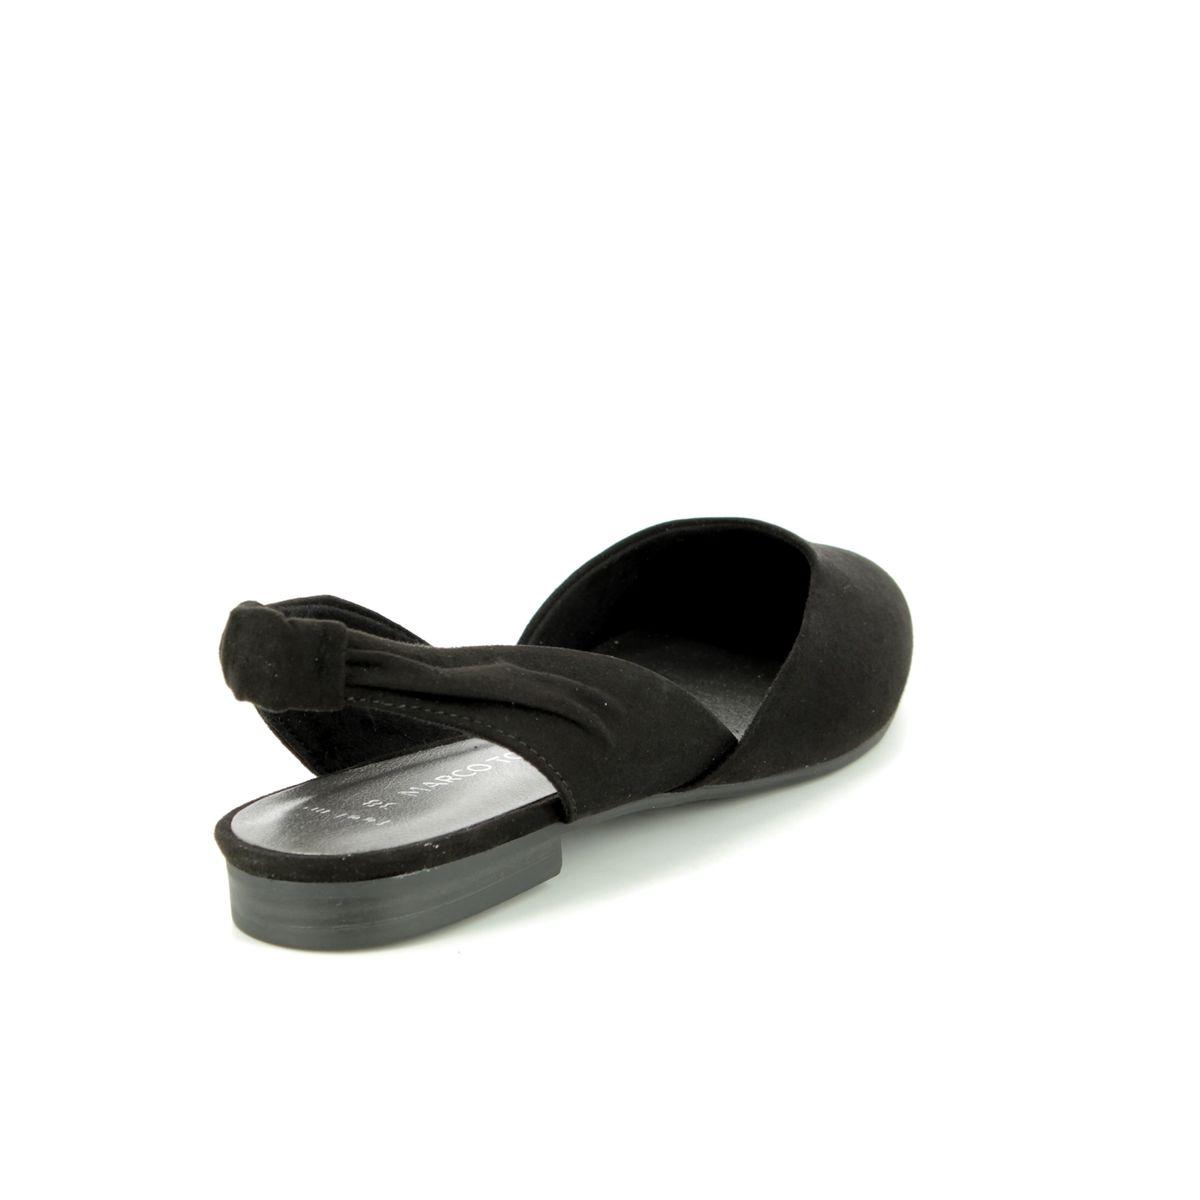 120574a24a99c Marco Tozzi Closed Toe Sandals - Black - 29409/32/001 BRAVISLING